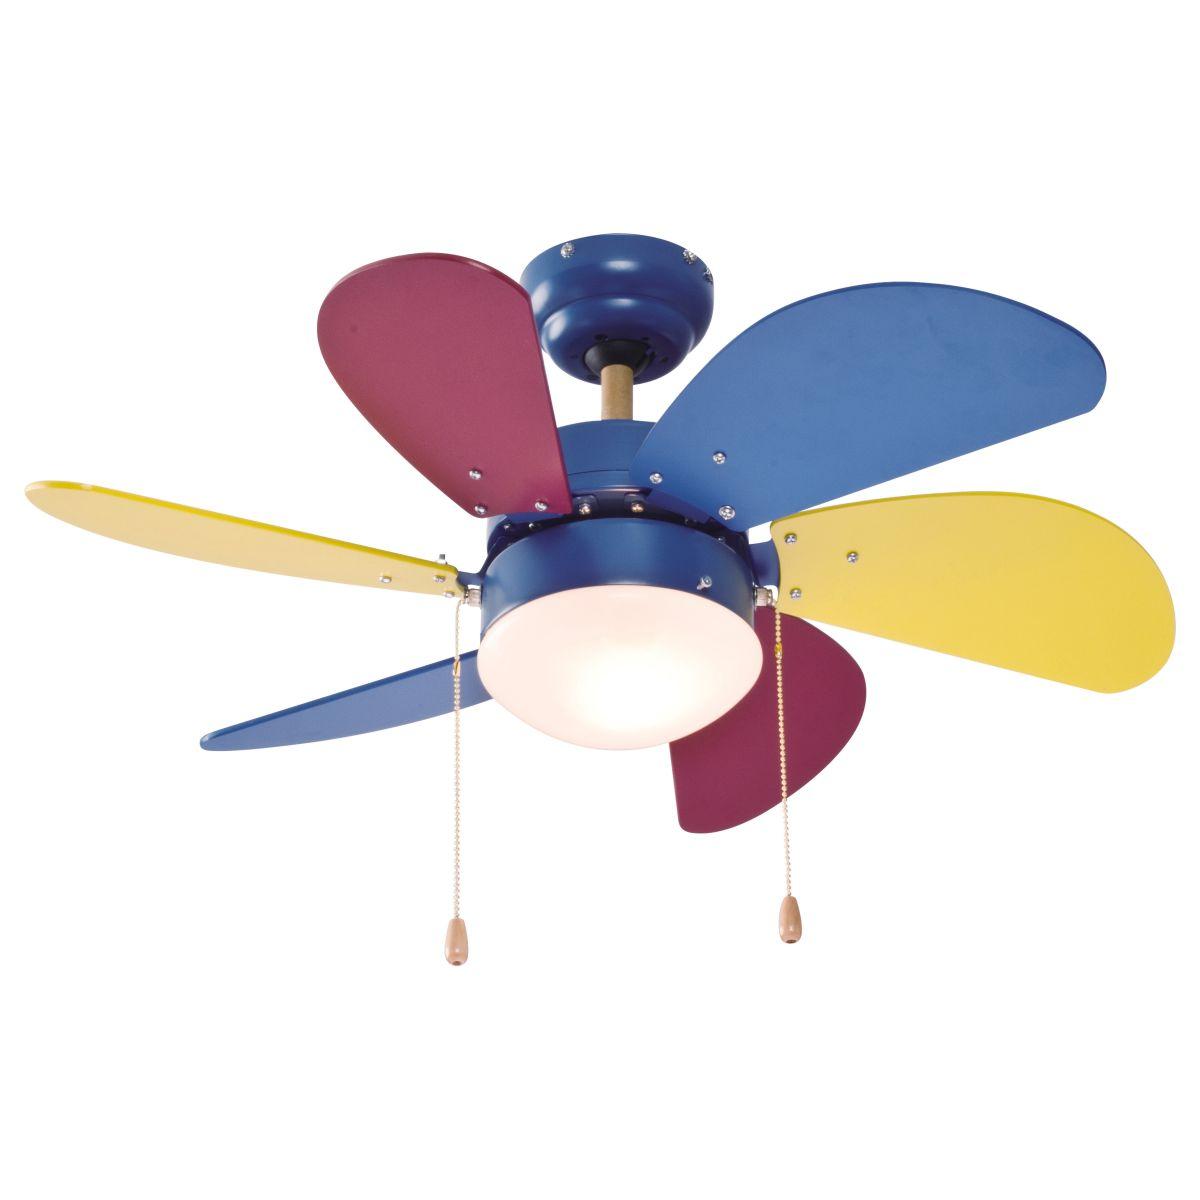 ventilatori a soffitto leroy merlin dj58 regardsdefemmes ForLampadario Ventilatore Leroy Merlin